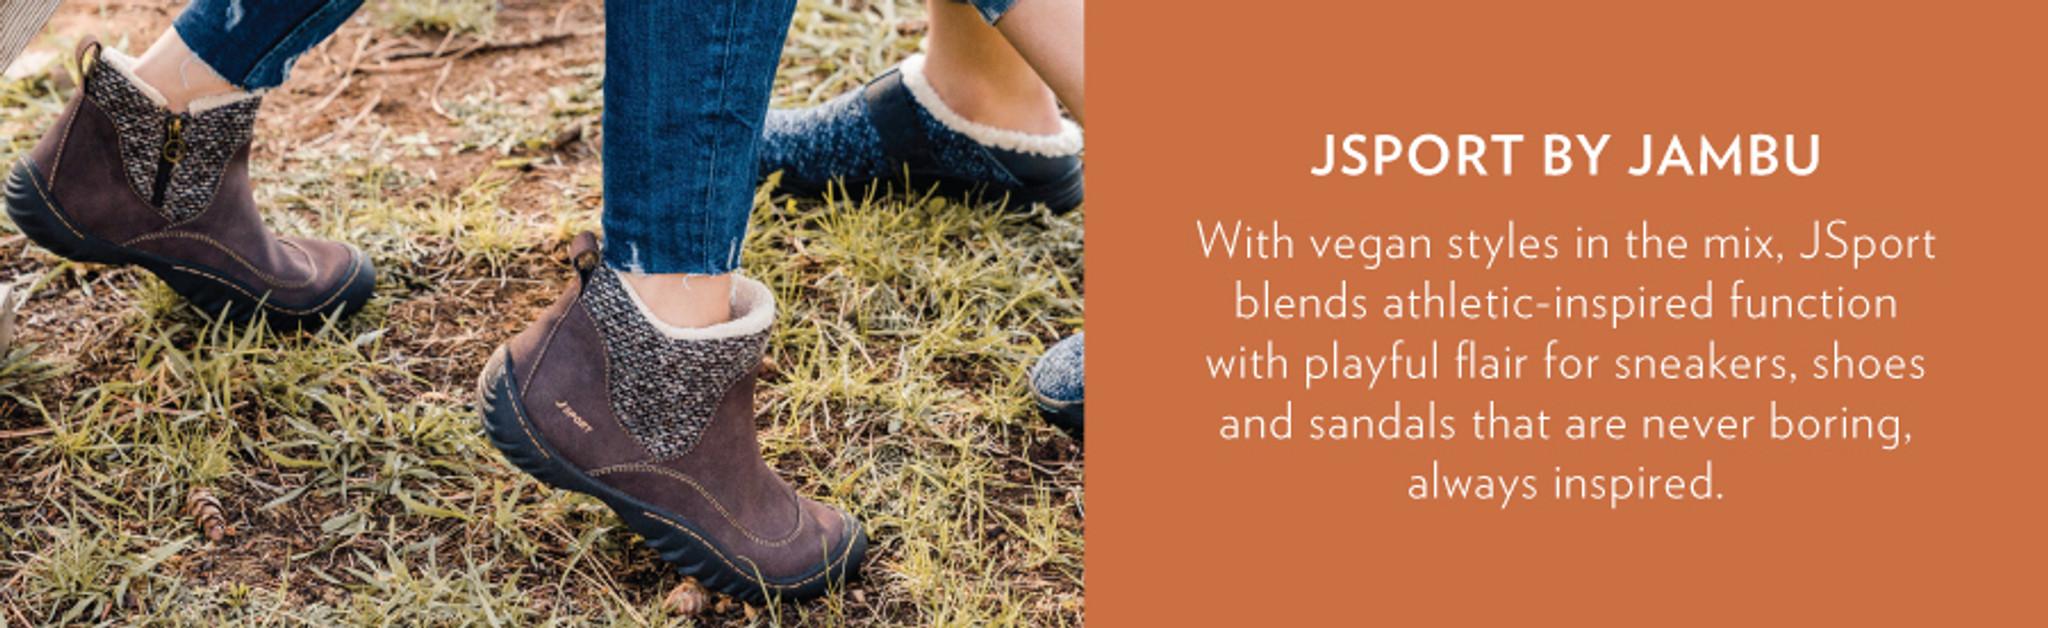 JSport by Jambu Shoes For Women   Jambu